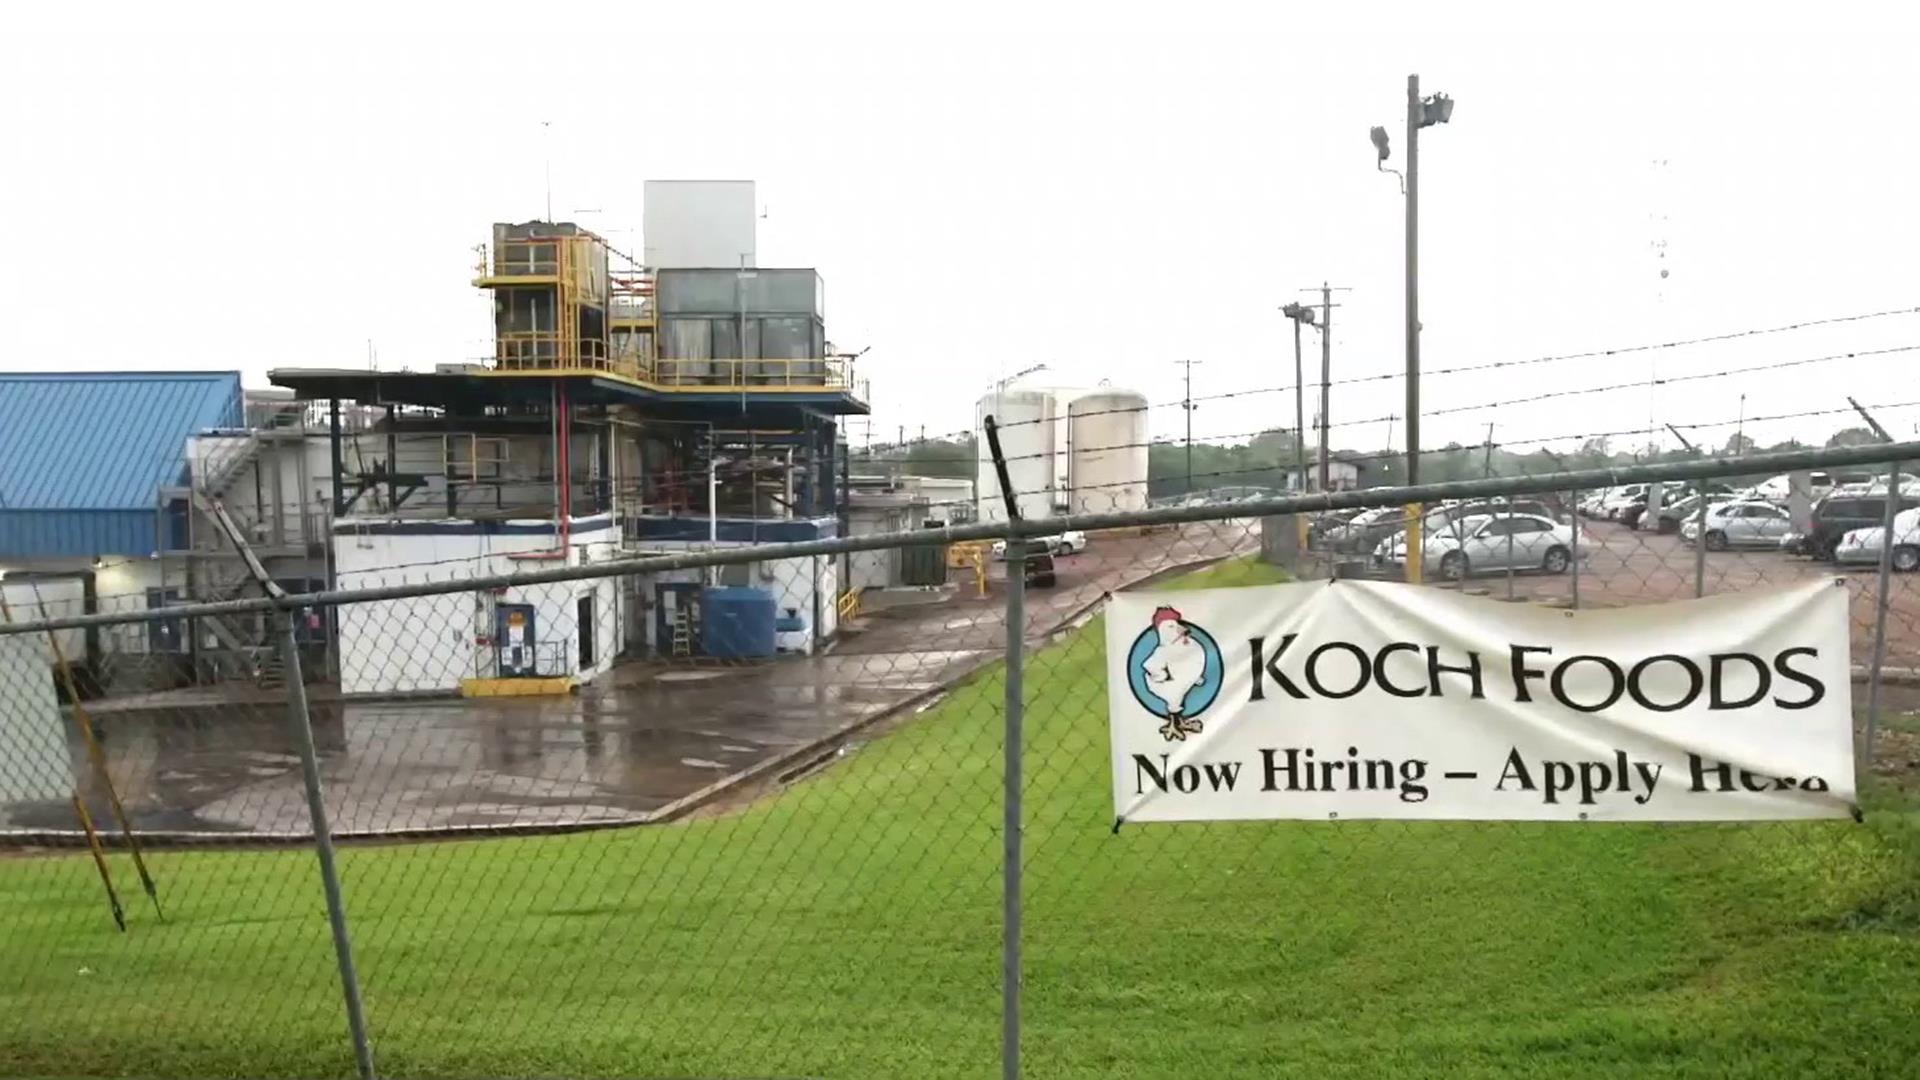 Koch Foods holds job fair following immigration raid of Mississippi plants